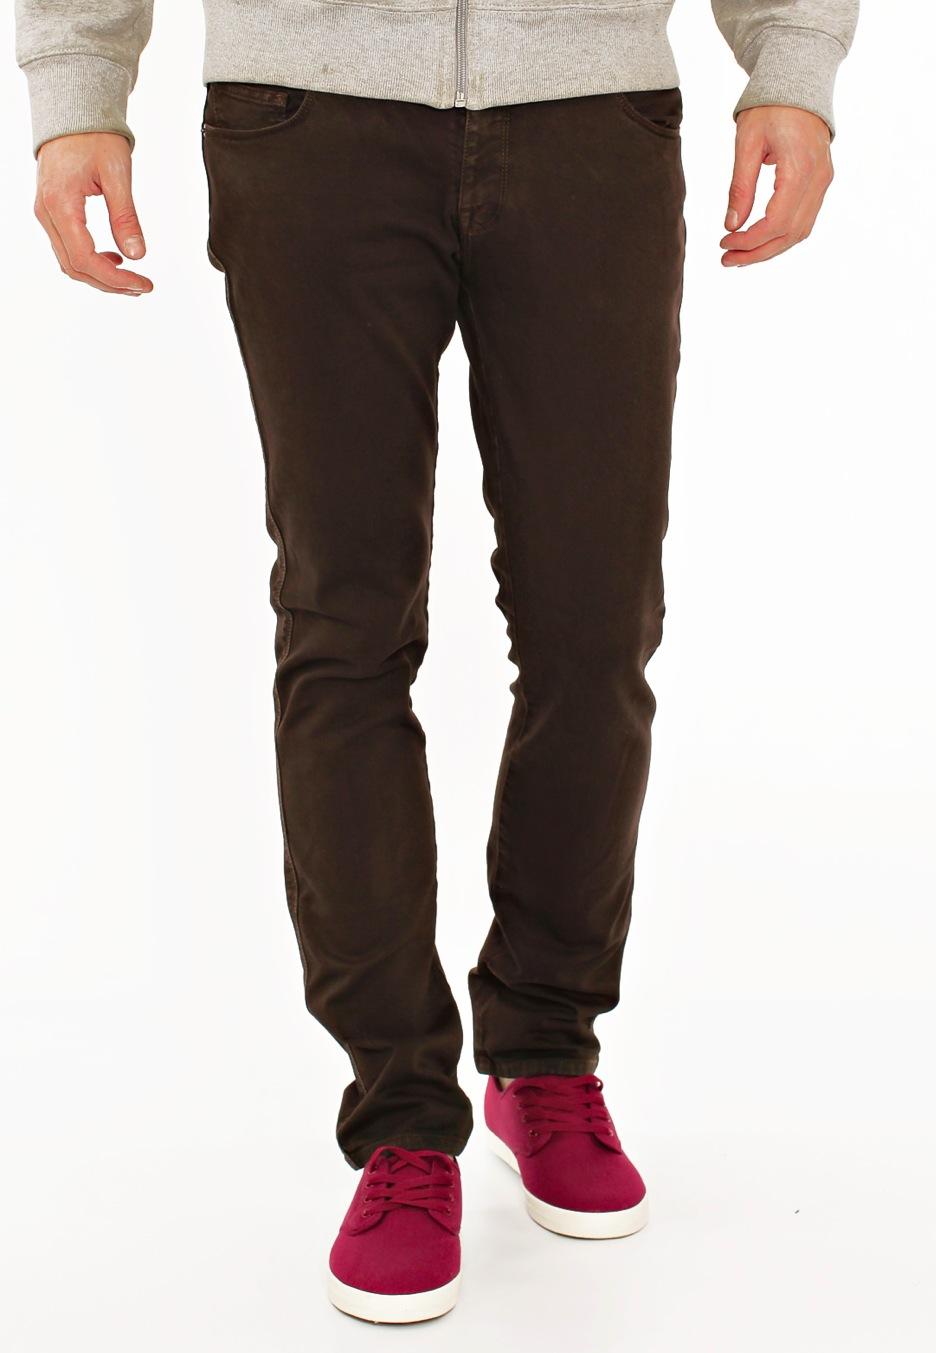 Volcom - Chili Chocker Drip Brown - Jeans - Streetwear Shop ...